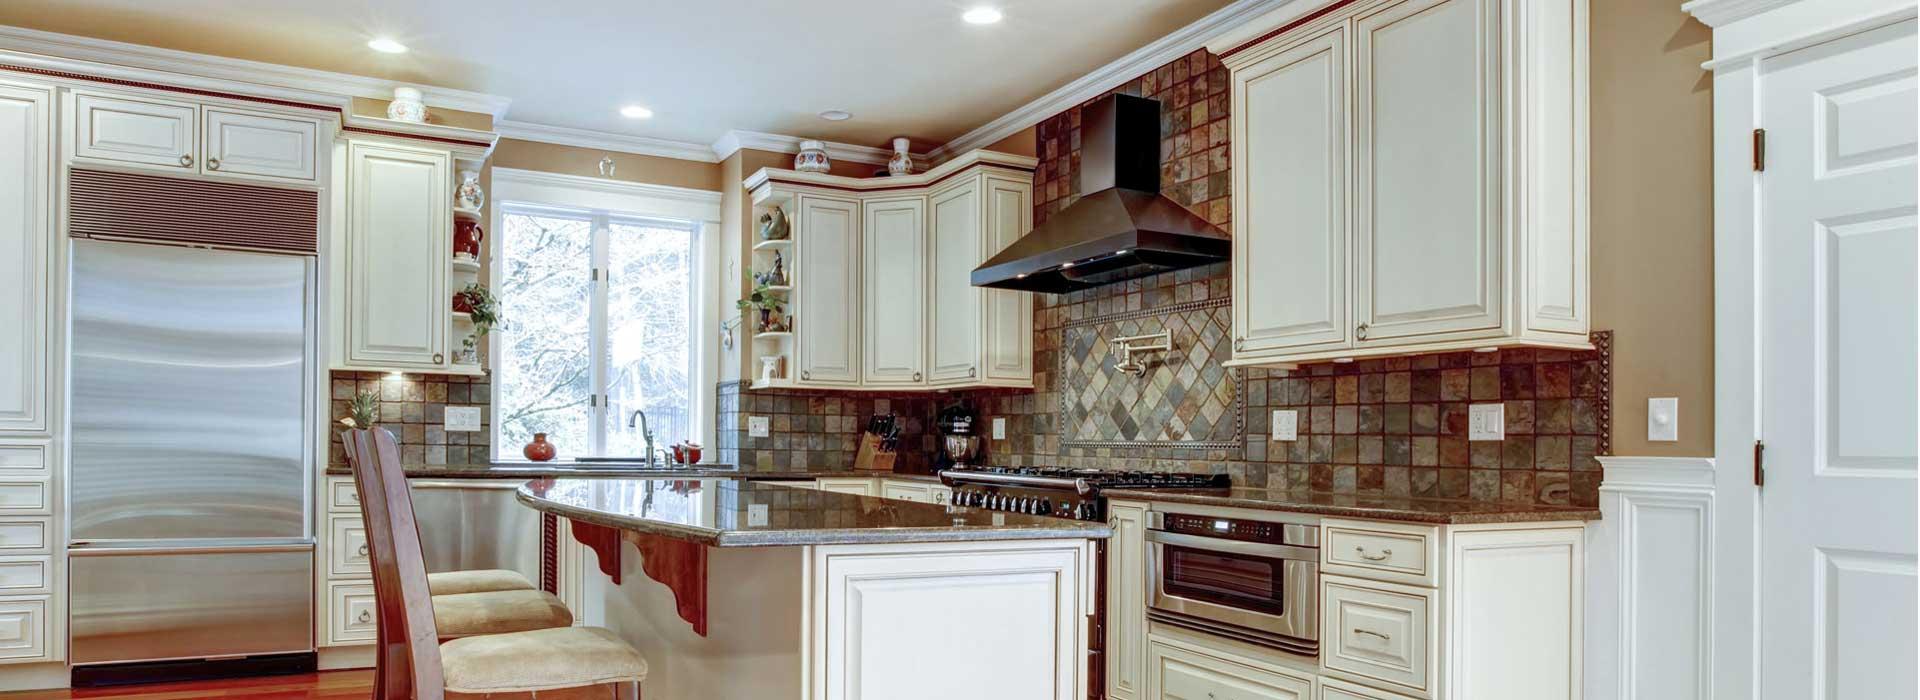 Kitchen Cabinet Cost